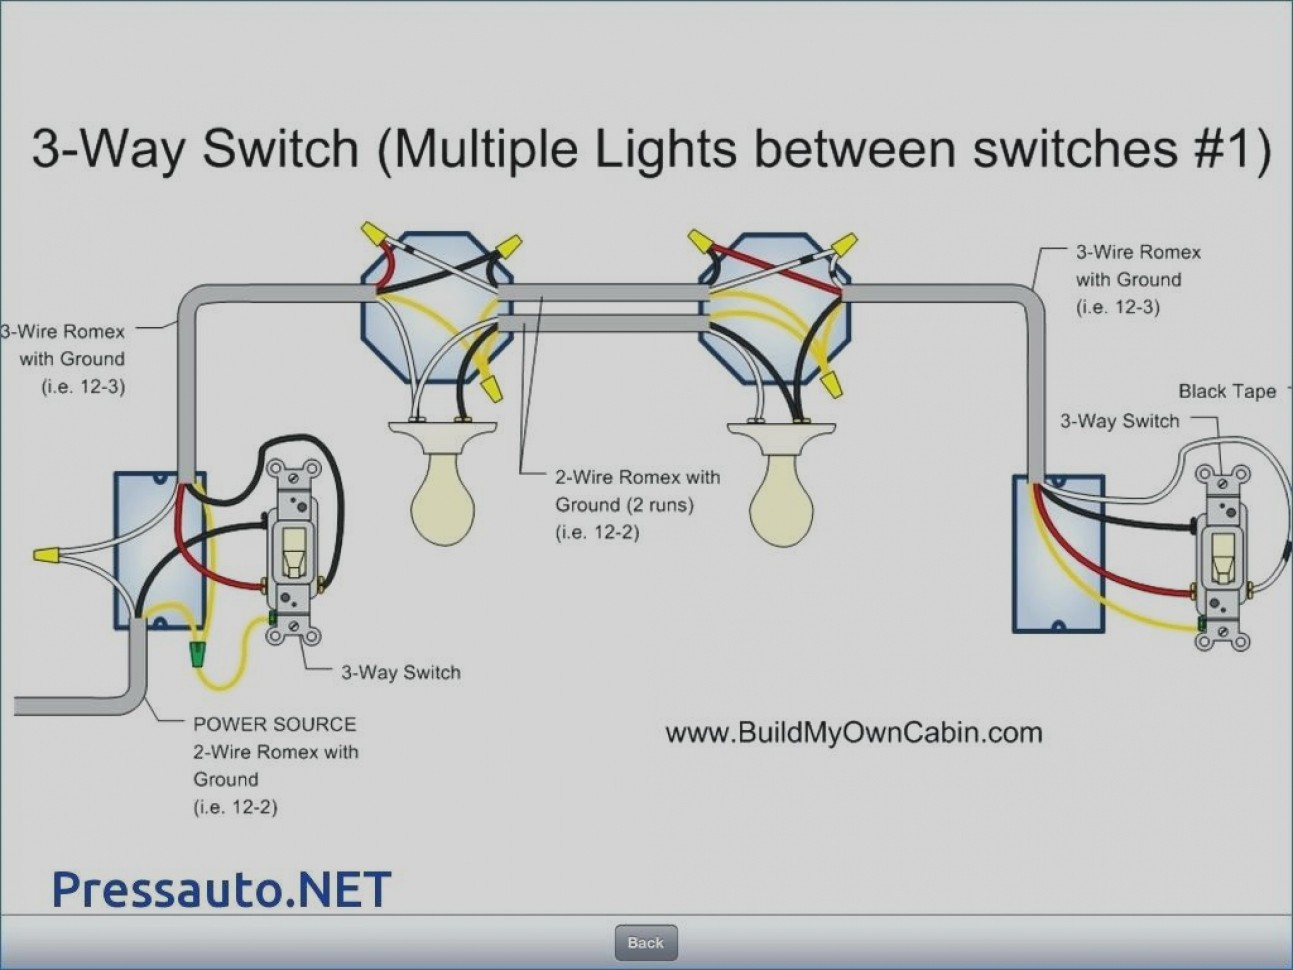 wire three way switch diagram multiple lights de 2400  multipul wiring diagram lights schematic wiring  de 2400  multipul wiring diagram lights